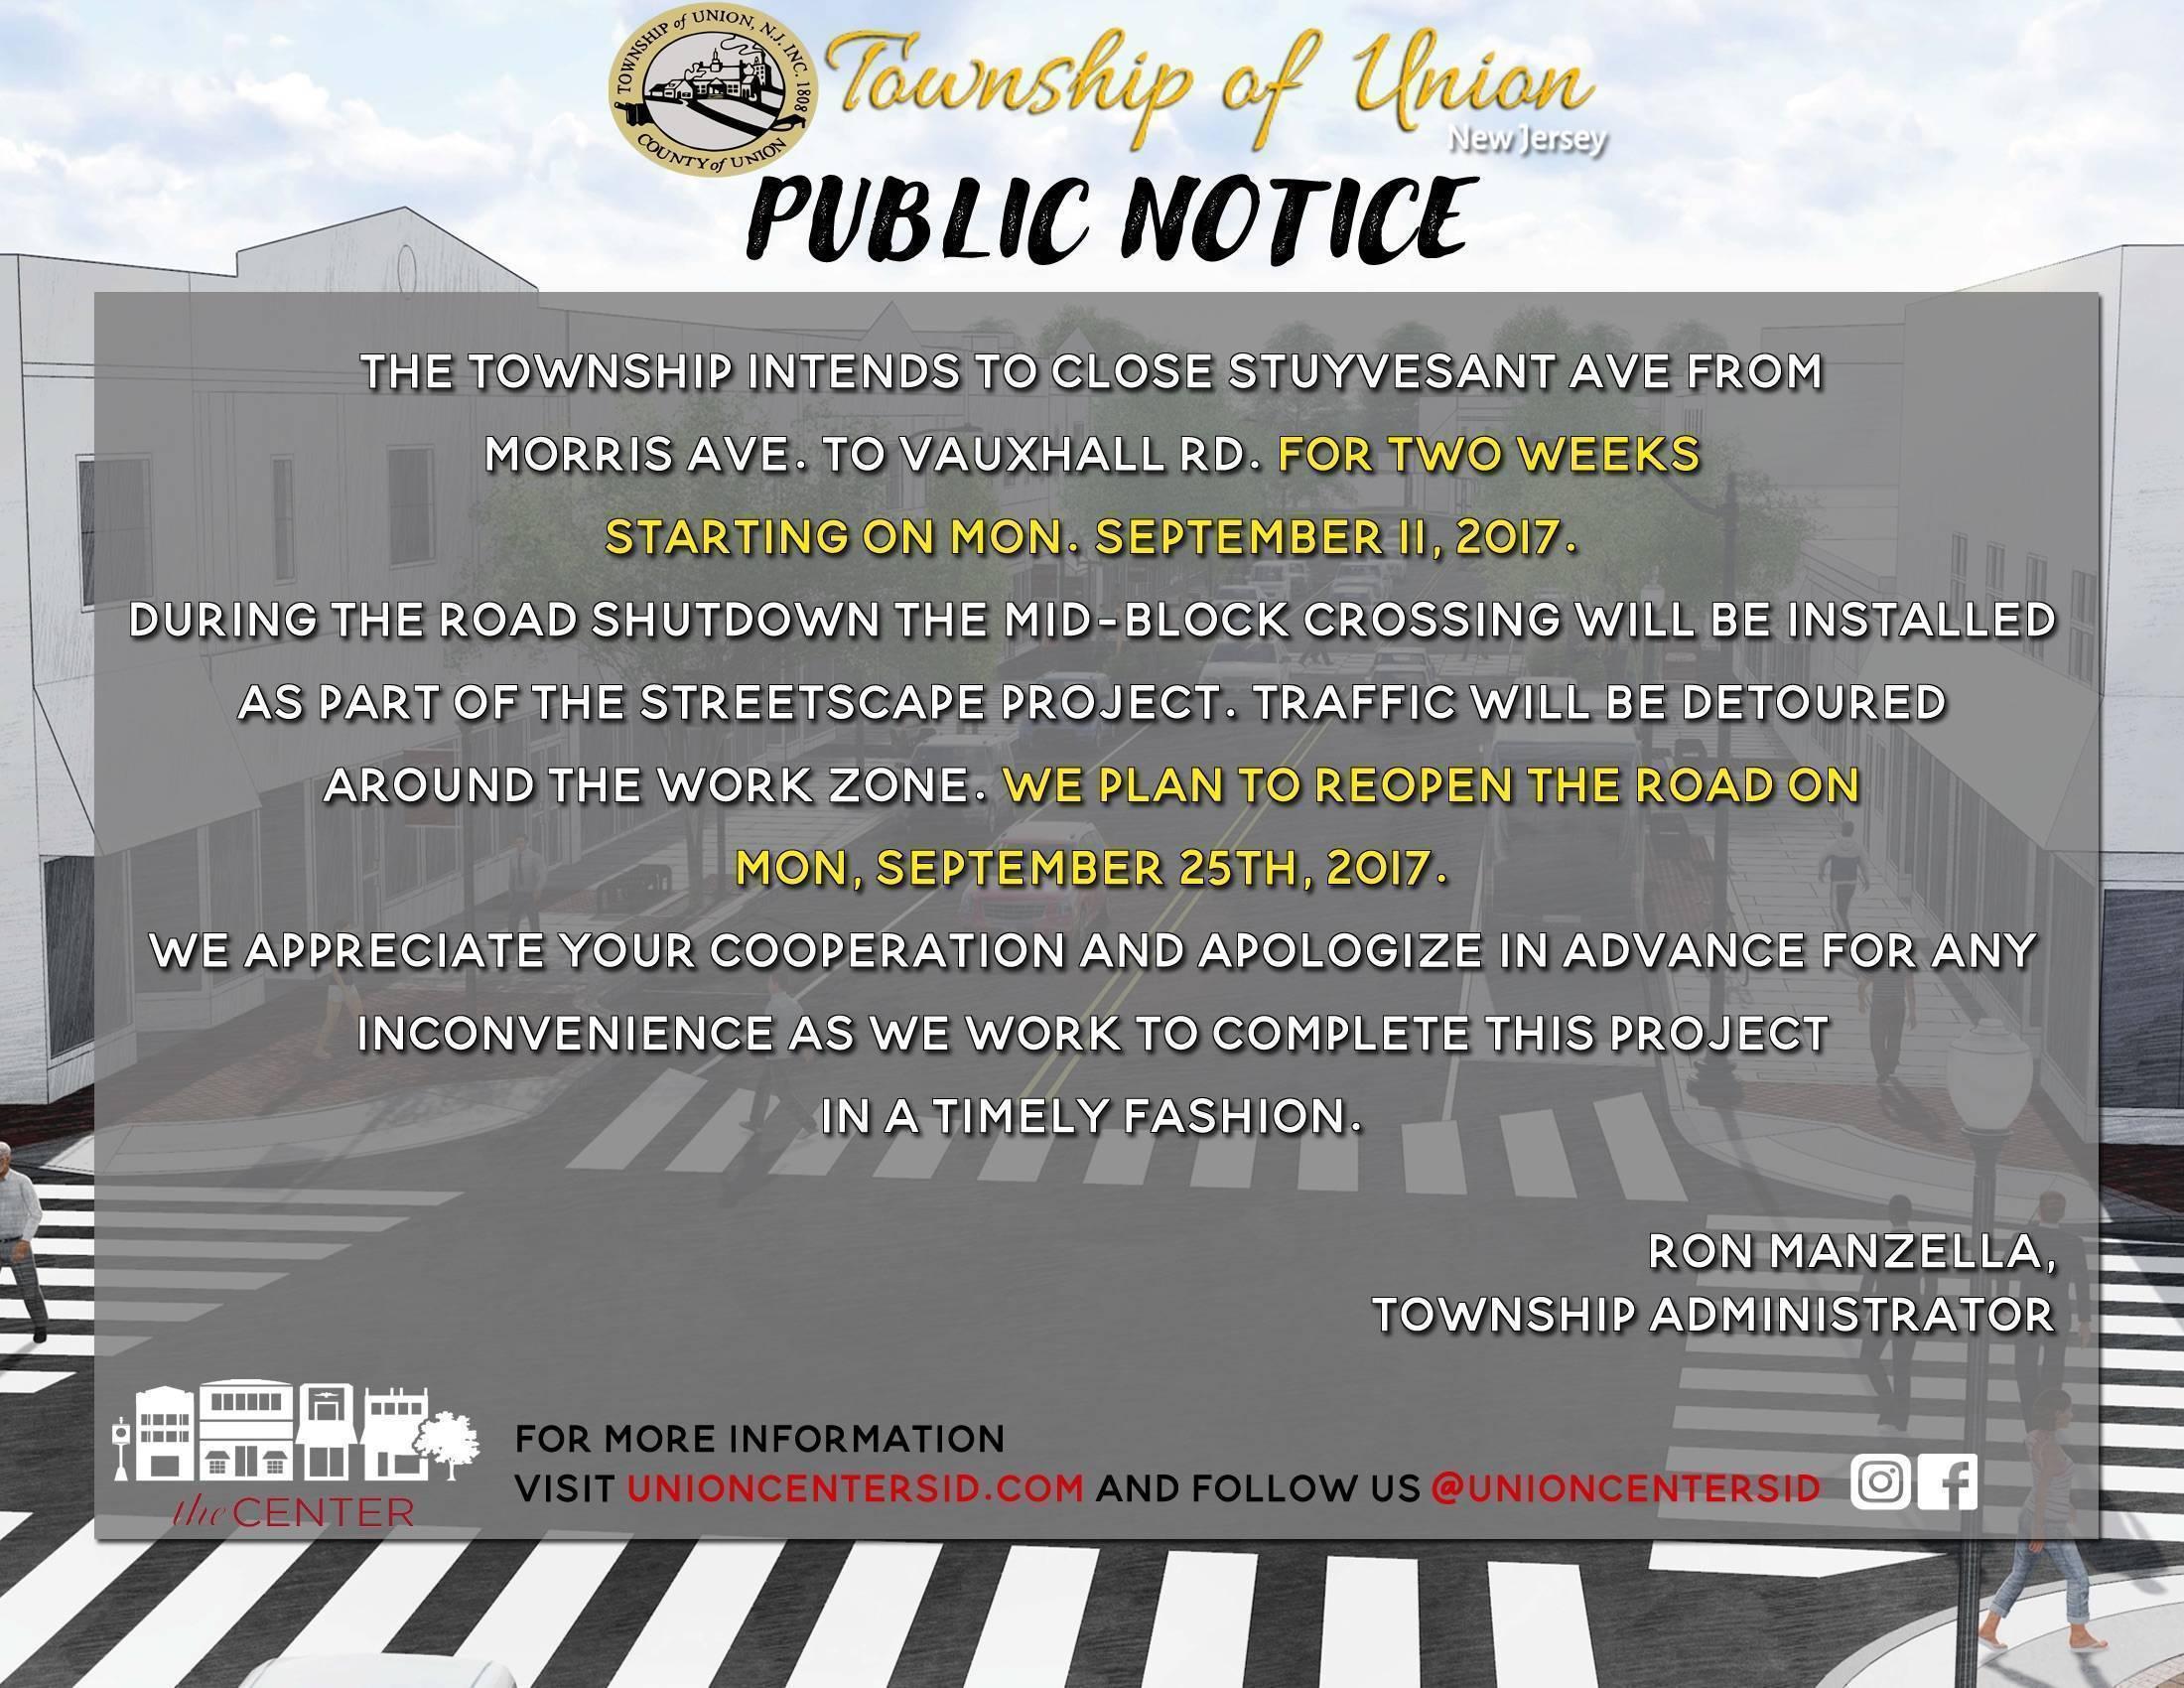 23aca8aeecca37b198c9_7b940d6dc0c75210f3ba_Stuyvesant_Ave_Closure_Public_Notice.jpg